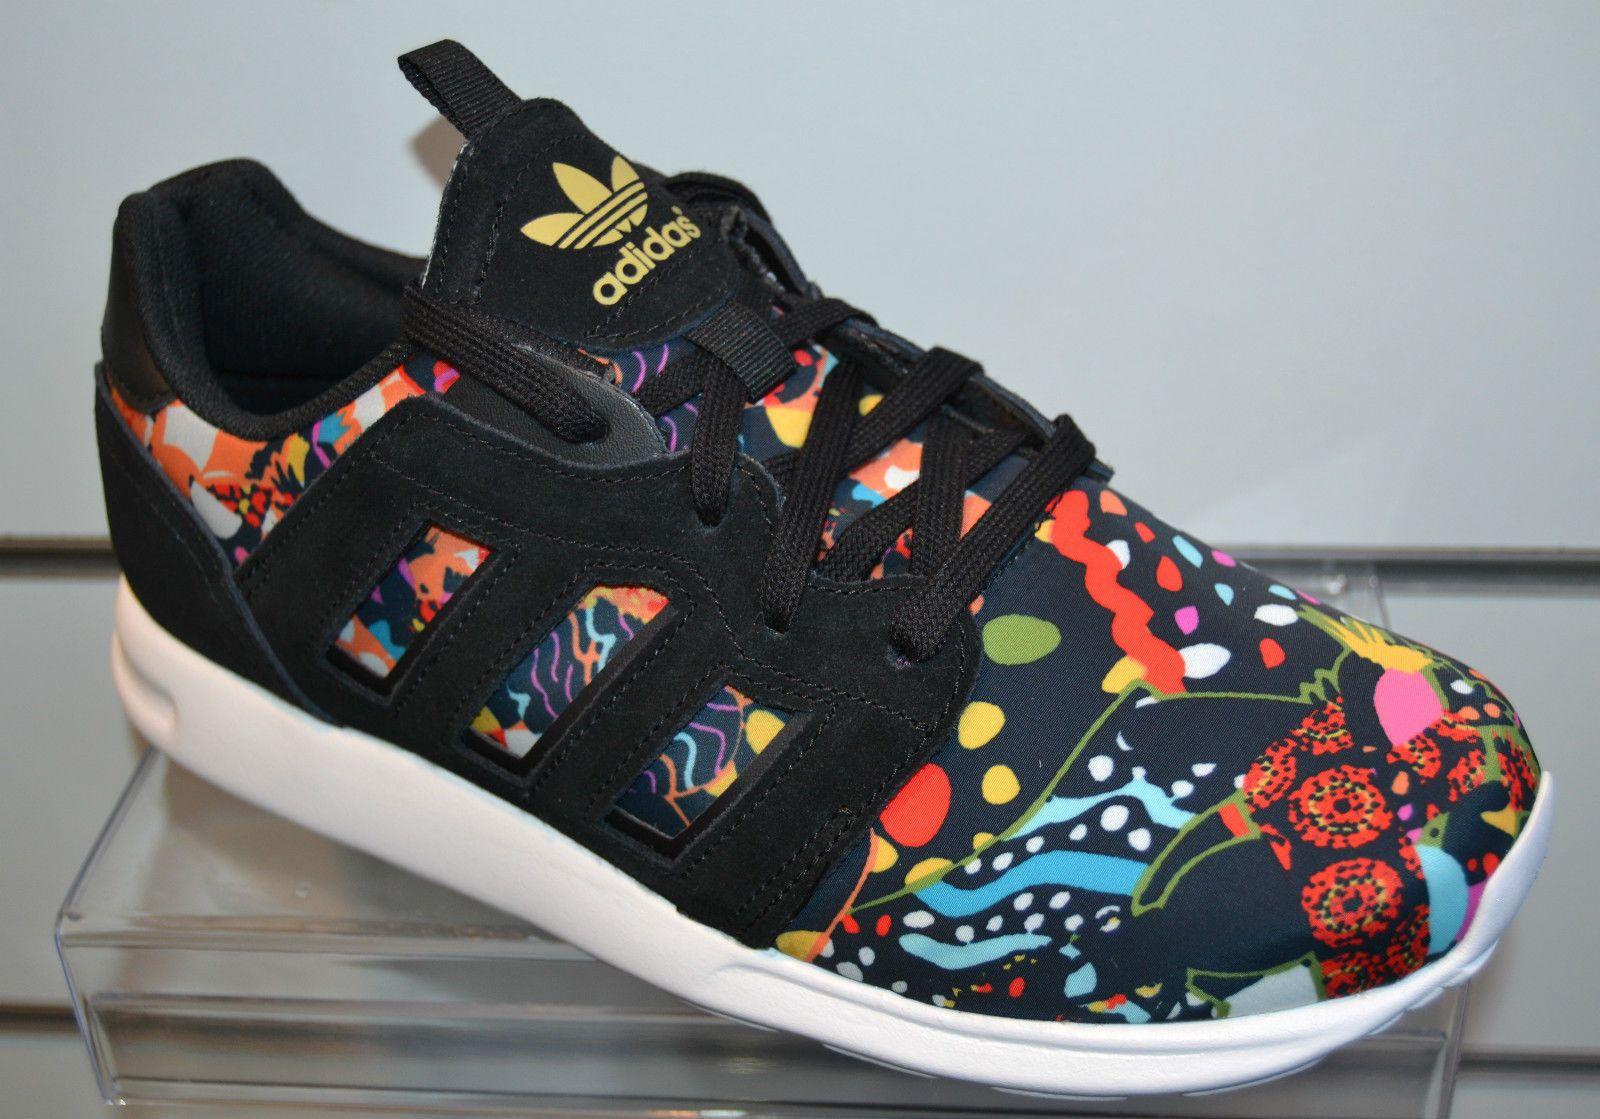 89074693e ... best price adidas zx 500 2.0 w damen sneaker turnschuhe sport flux 8000  m20894 ebay 95032 ...